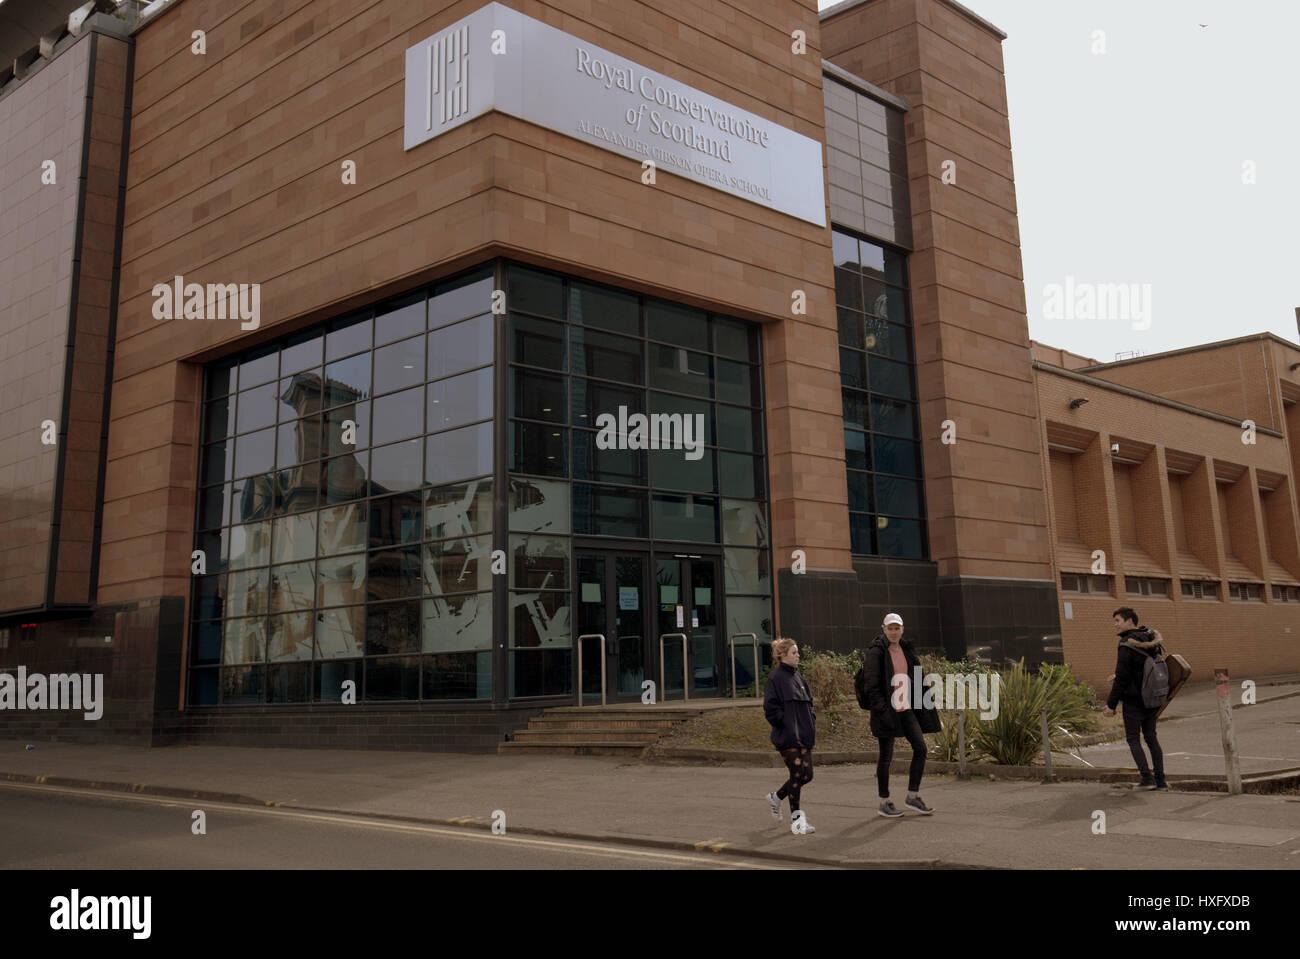 Royal Conservatoire of Scotland Glasgow - Stock Image